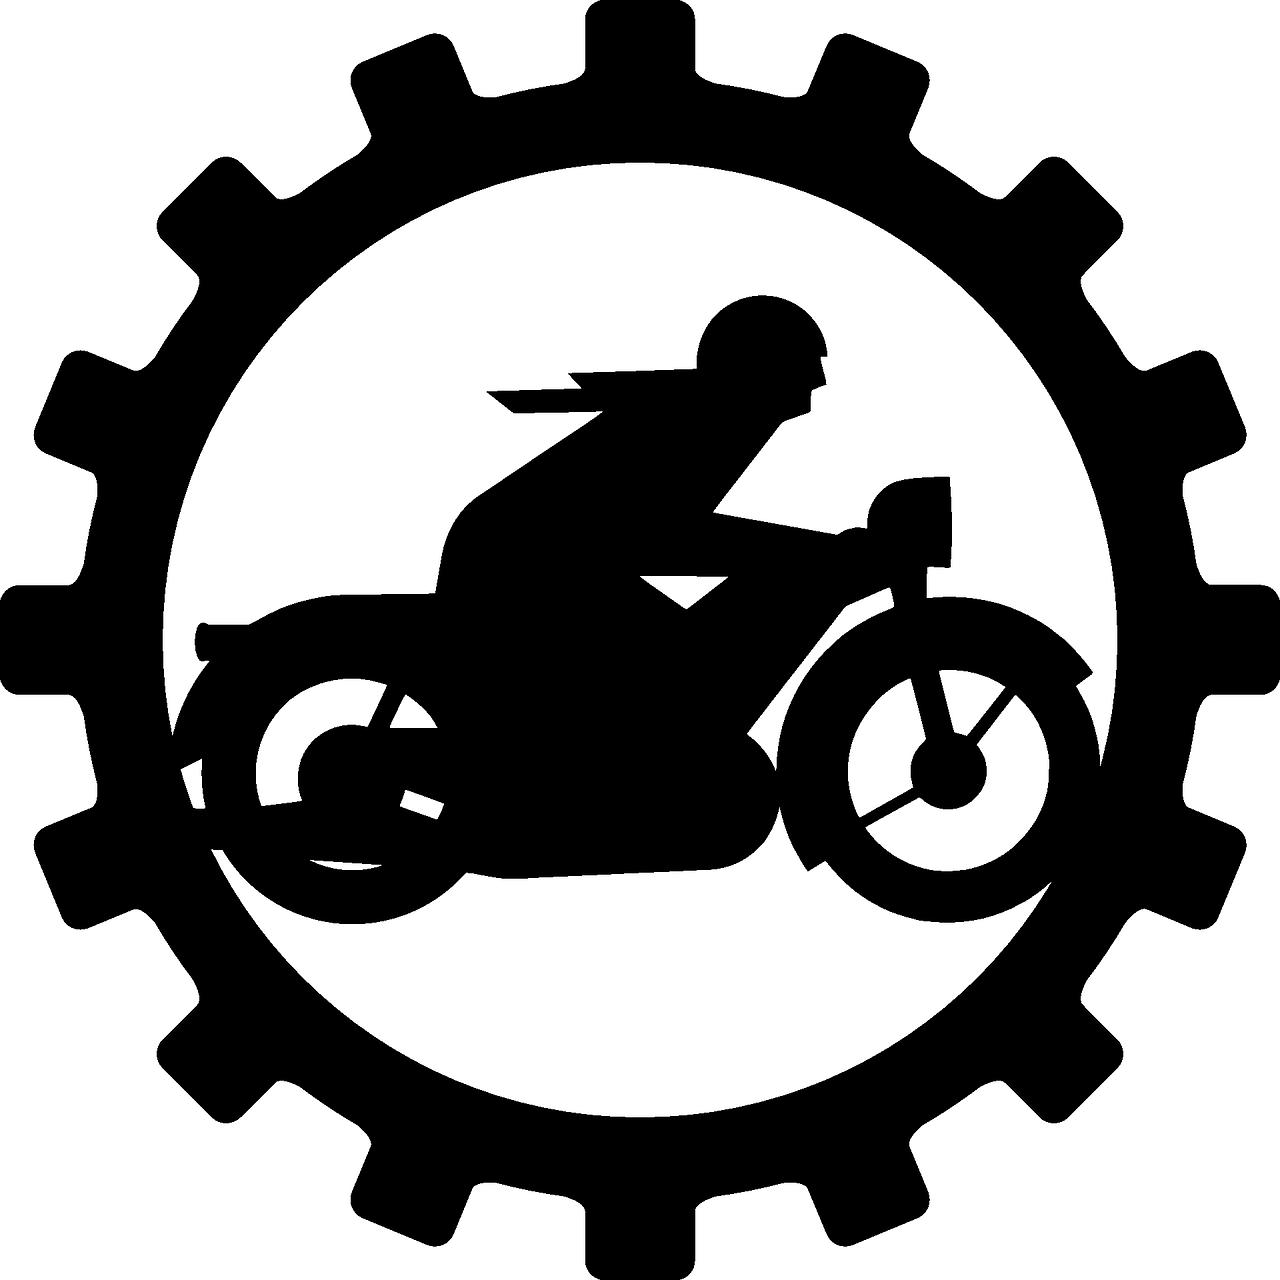 Imagini pentru yamaha logo. Motorcycle clipart silhouette